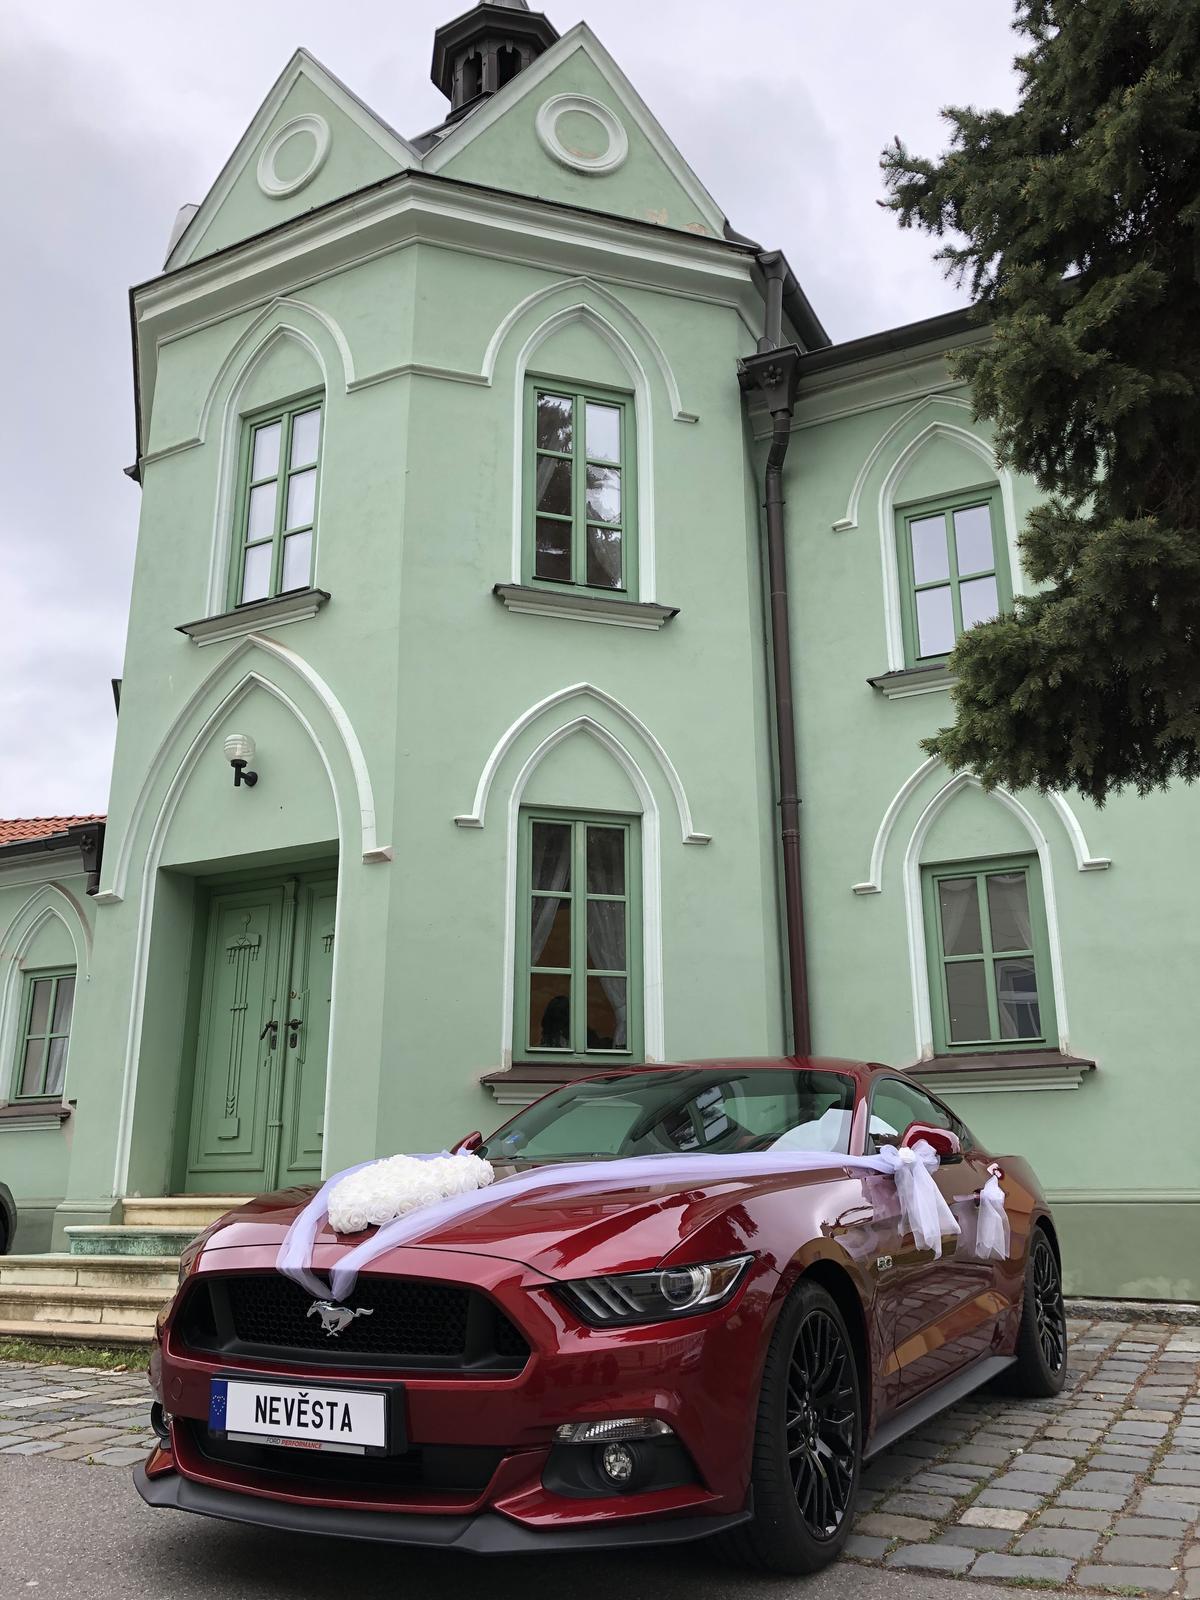 Mustangem na svatbu - Obrázek č. 5